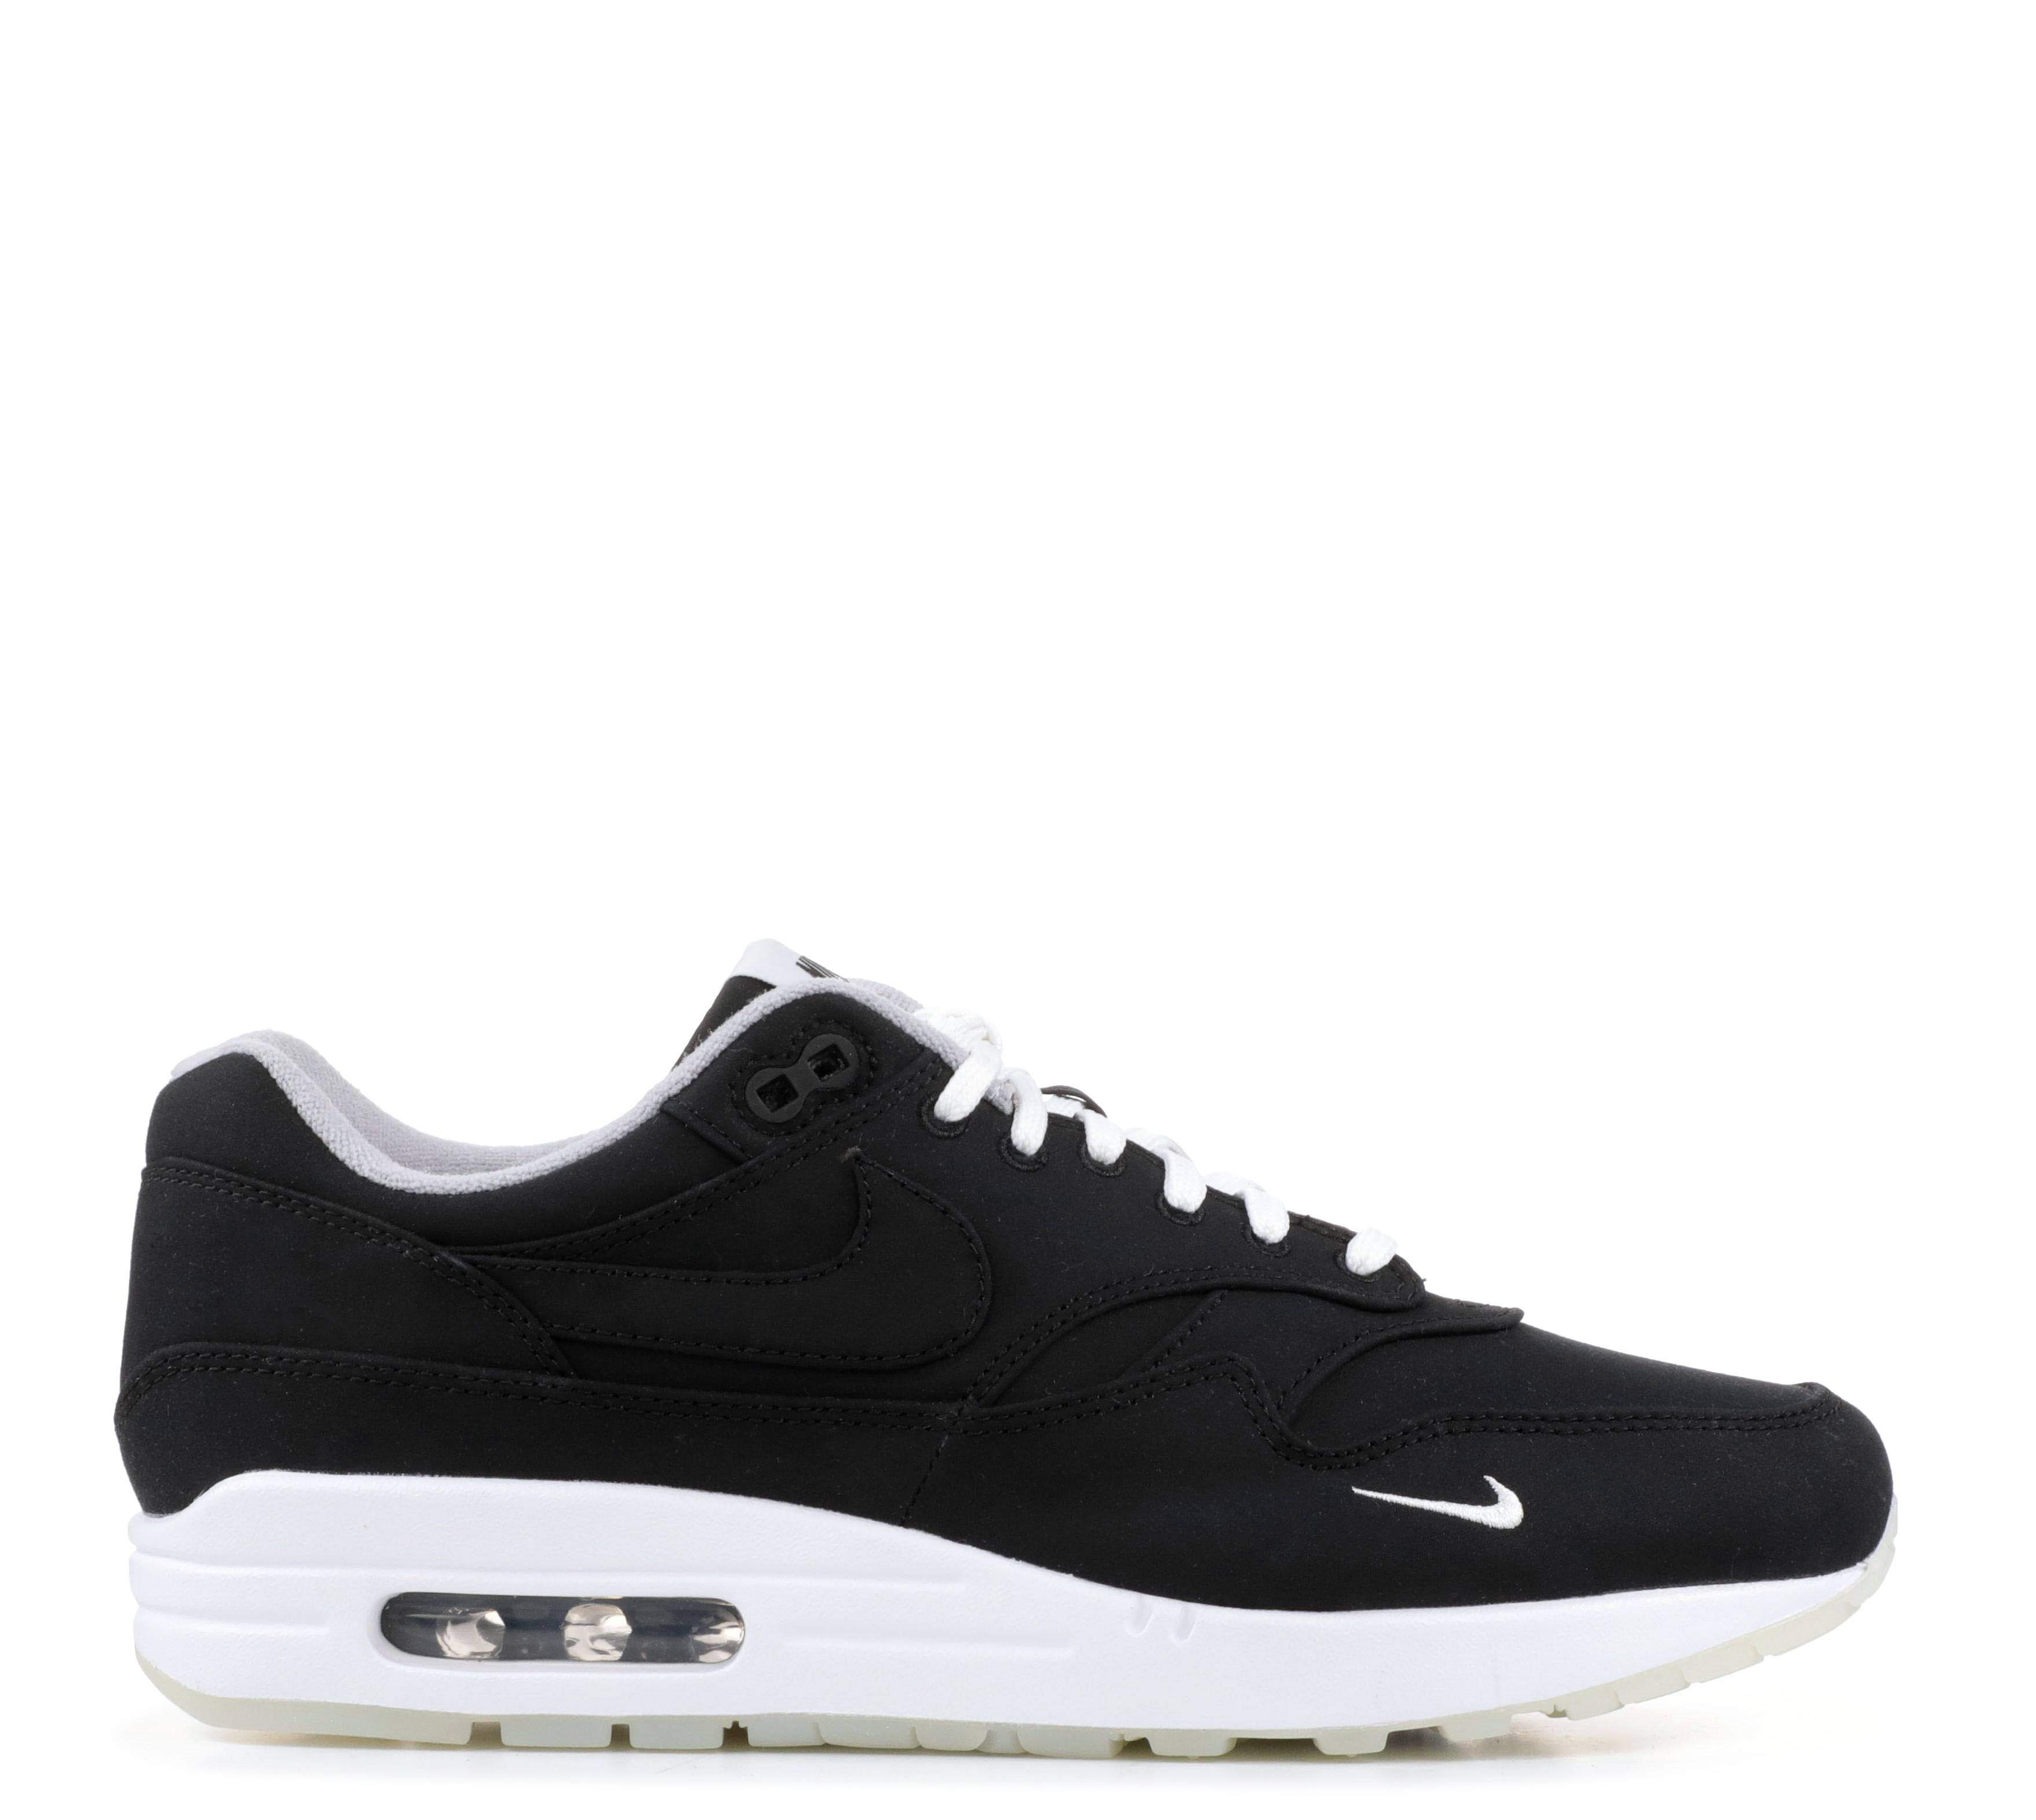 "Dover Street Market x NikeLab Air Max 1 'Black' ""Black"""